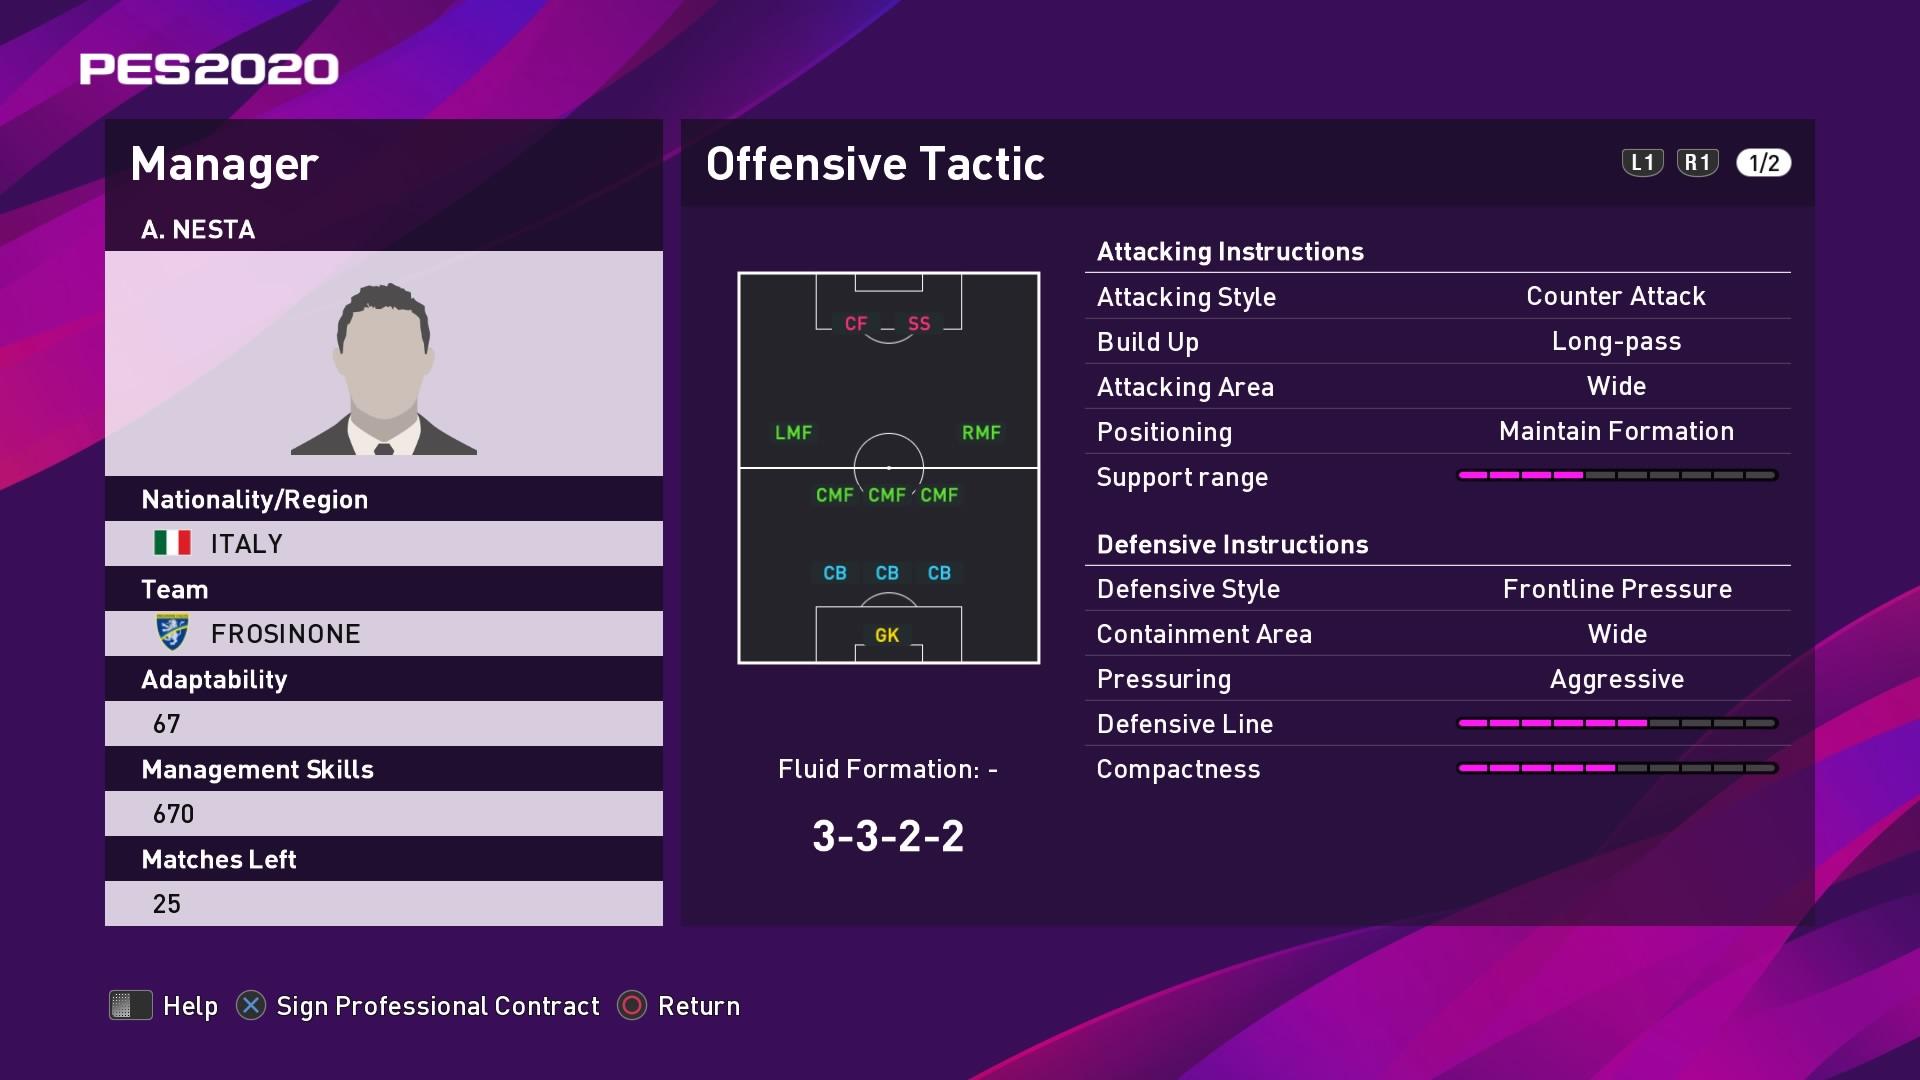 A. Nesta (Alessandro Nesta) Offensive Tactic in PES 2020 myClub